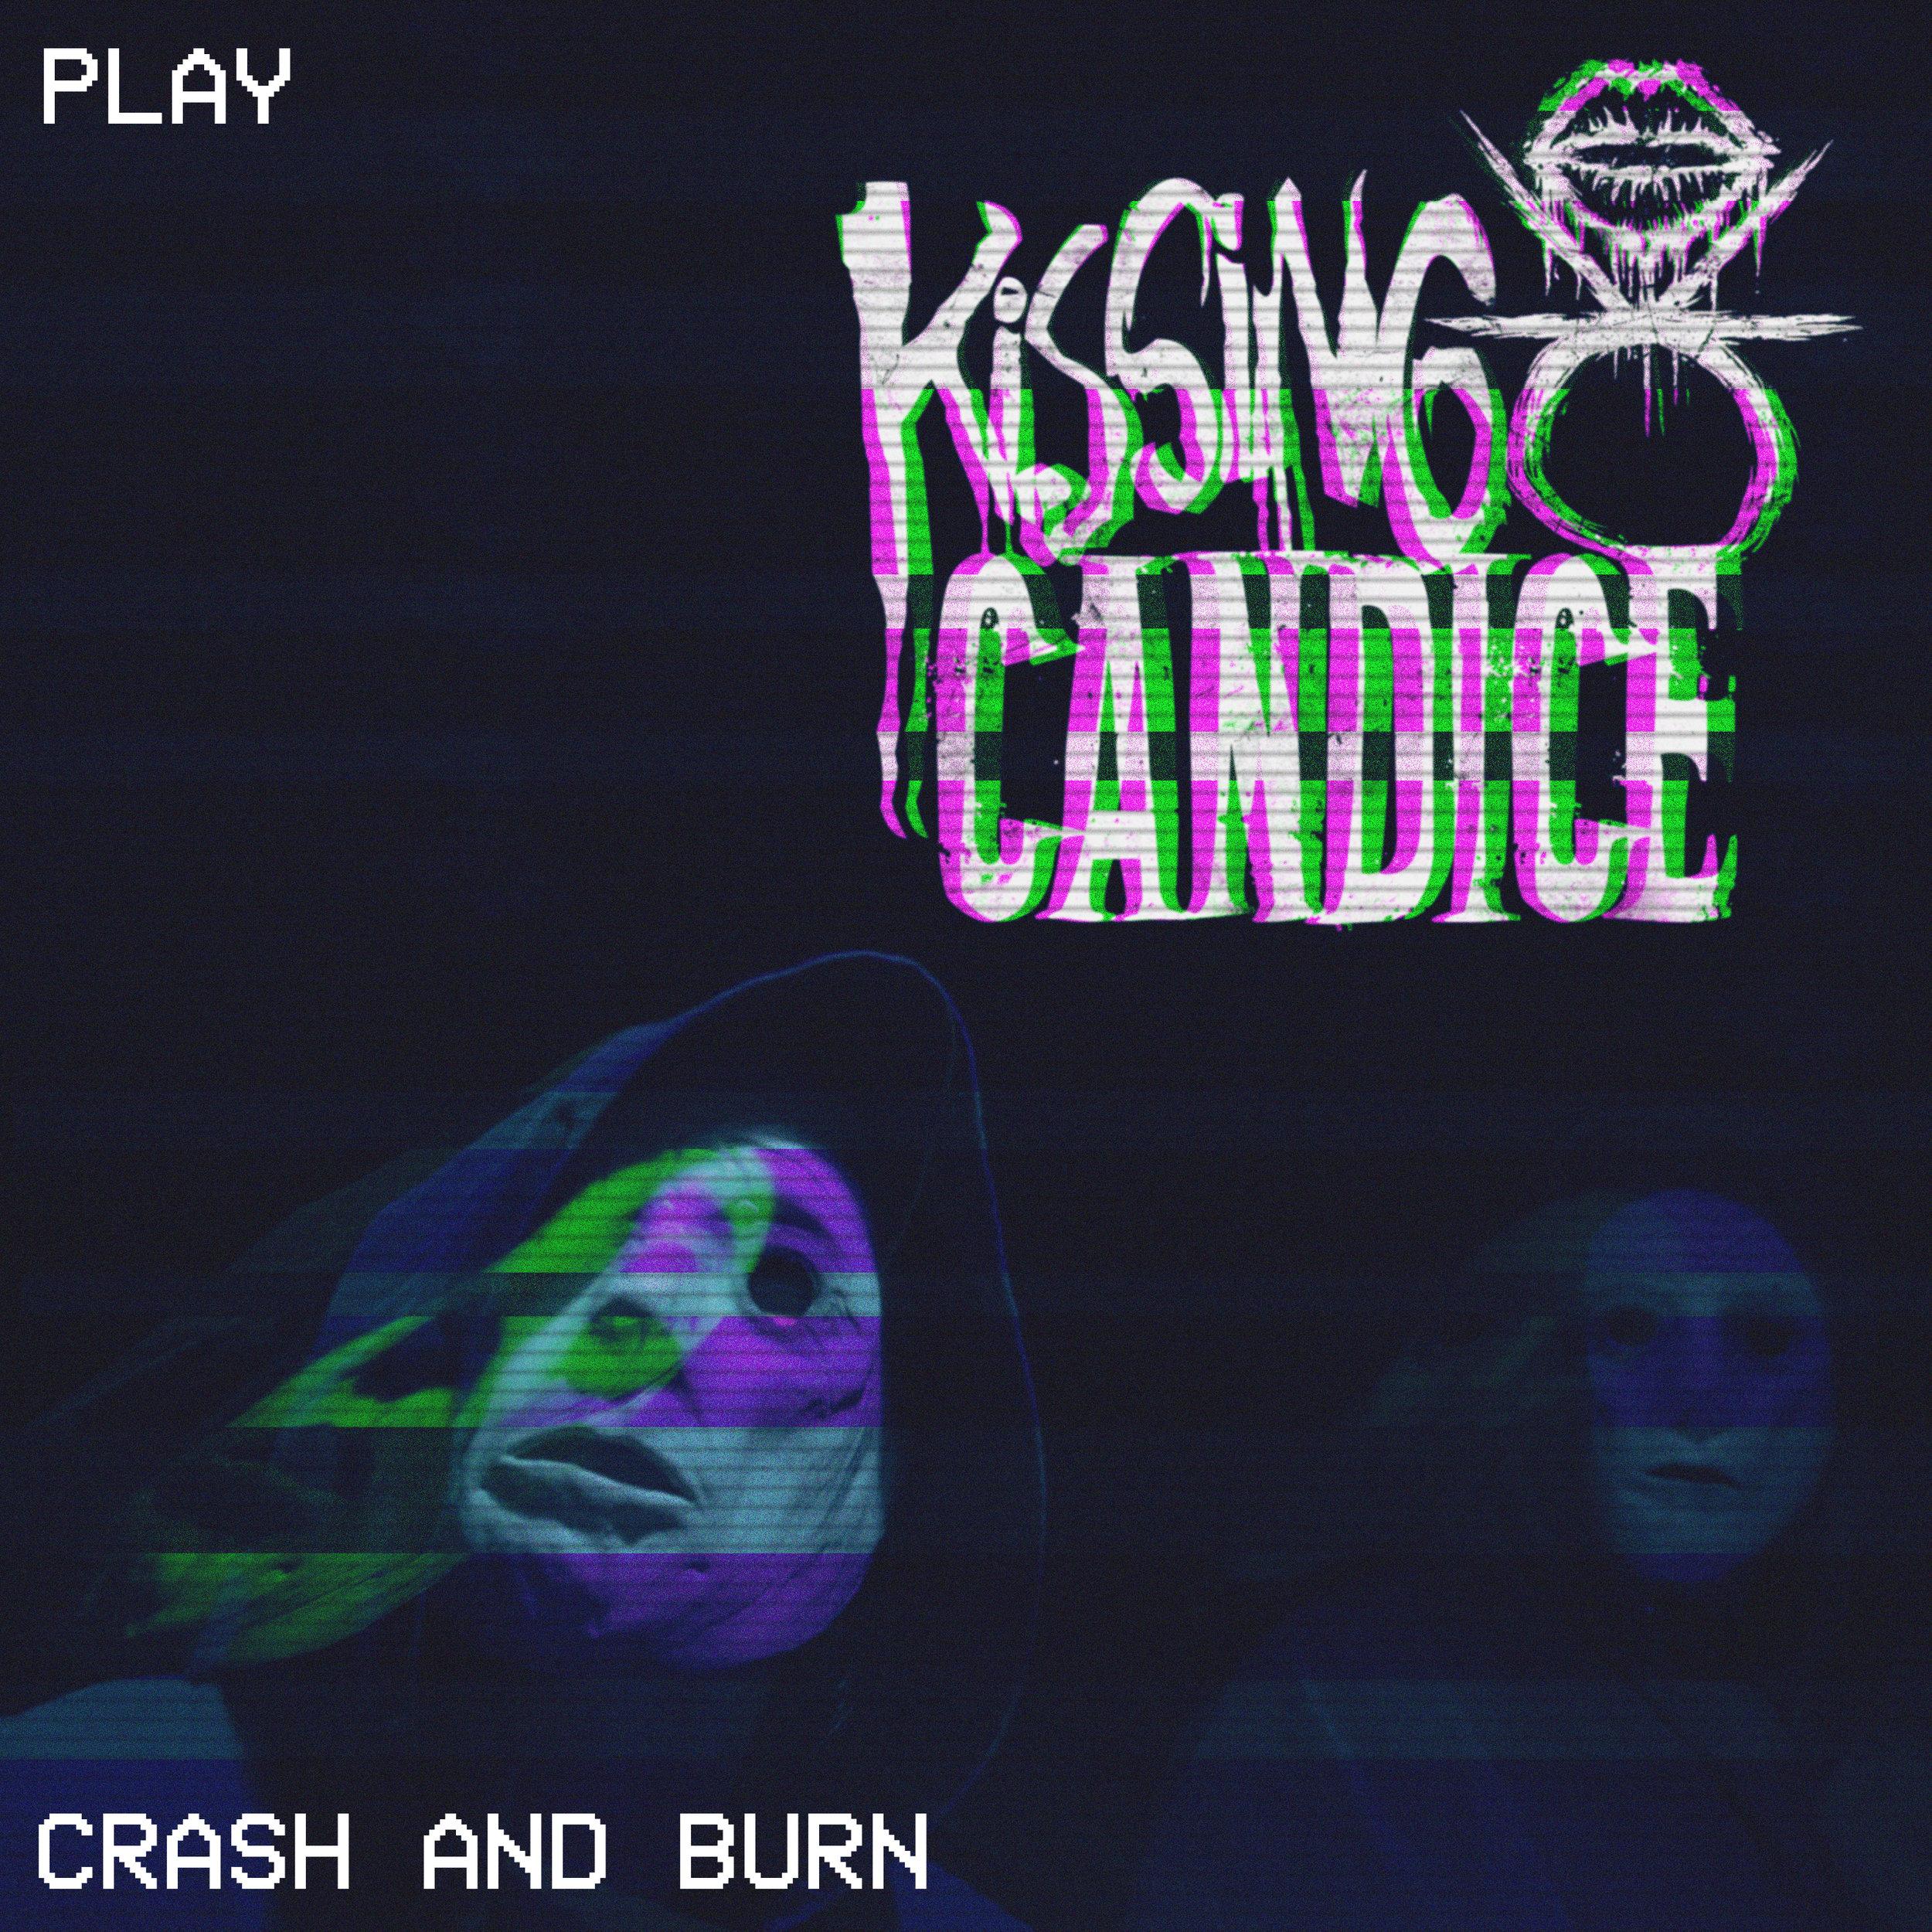 Crash and Burn - Single (2019 Self-Release)